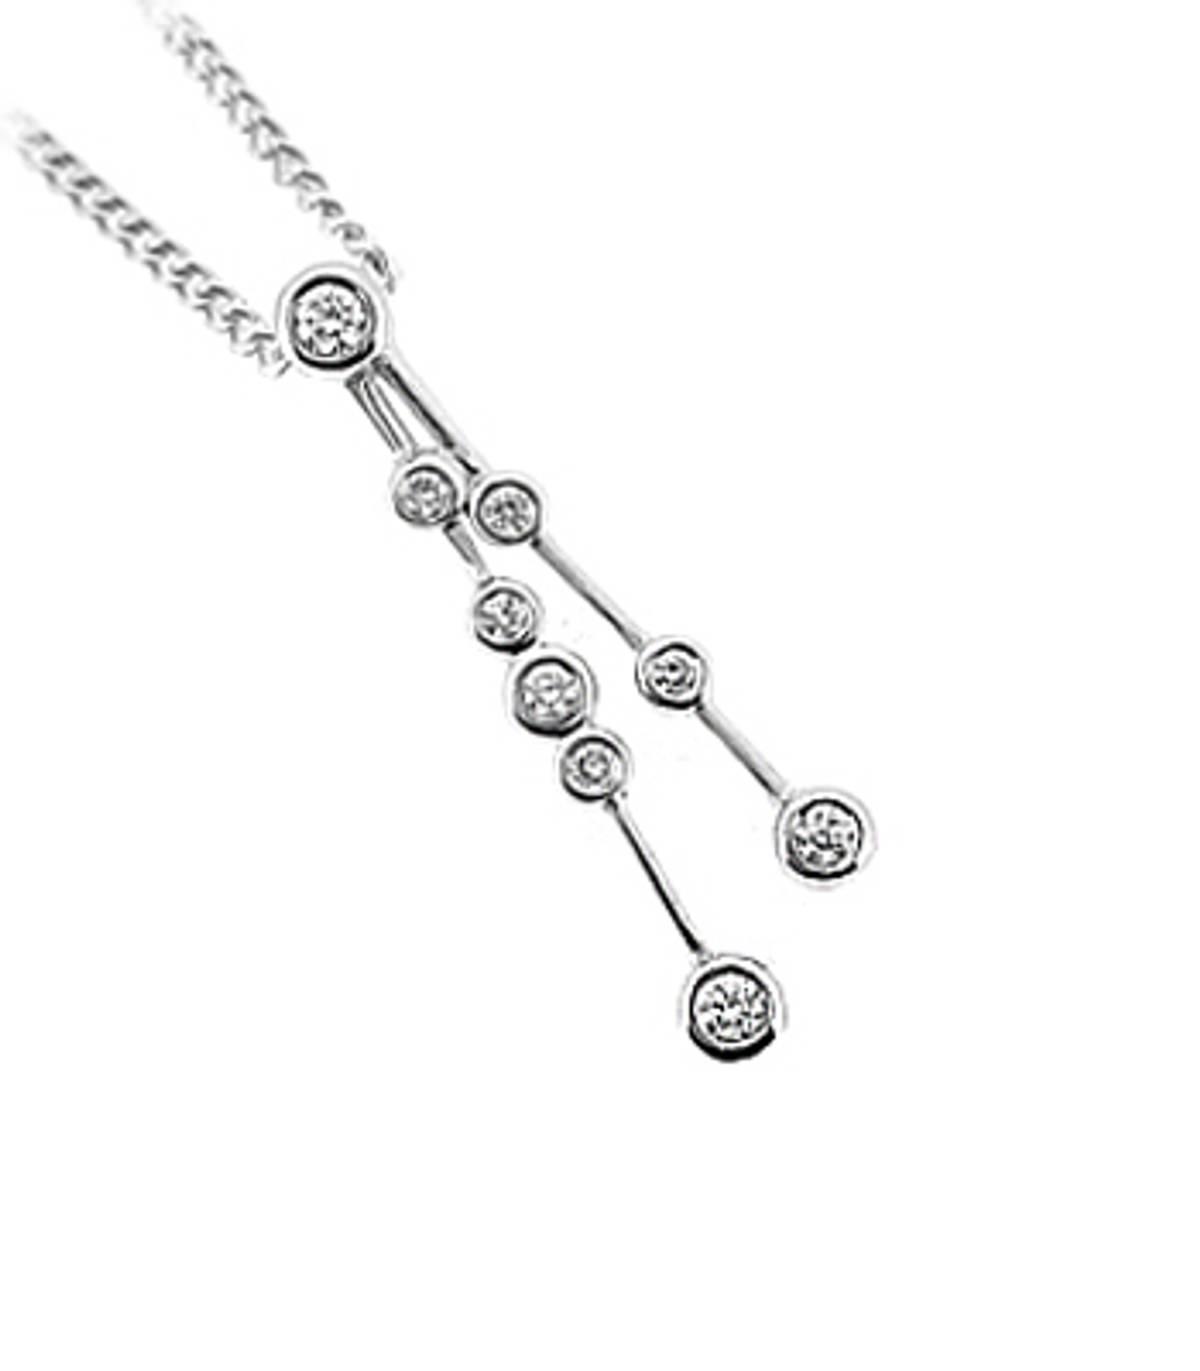 DP38379 stone diamond rubover set drop pendantPictured item: total 0.13ct brilliant cut diamond set in 18k white goldAvailable in: 18k gold